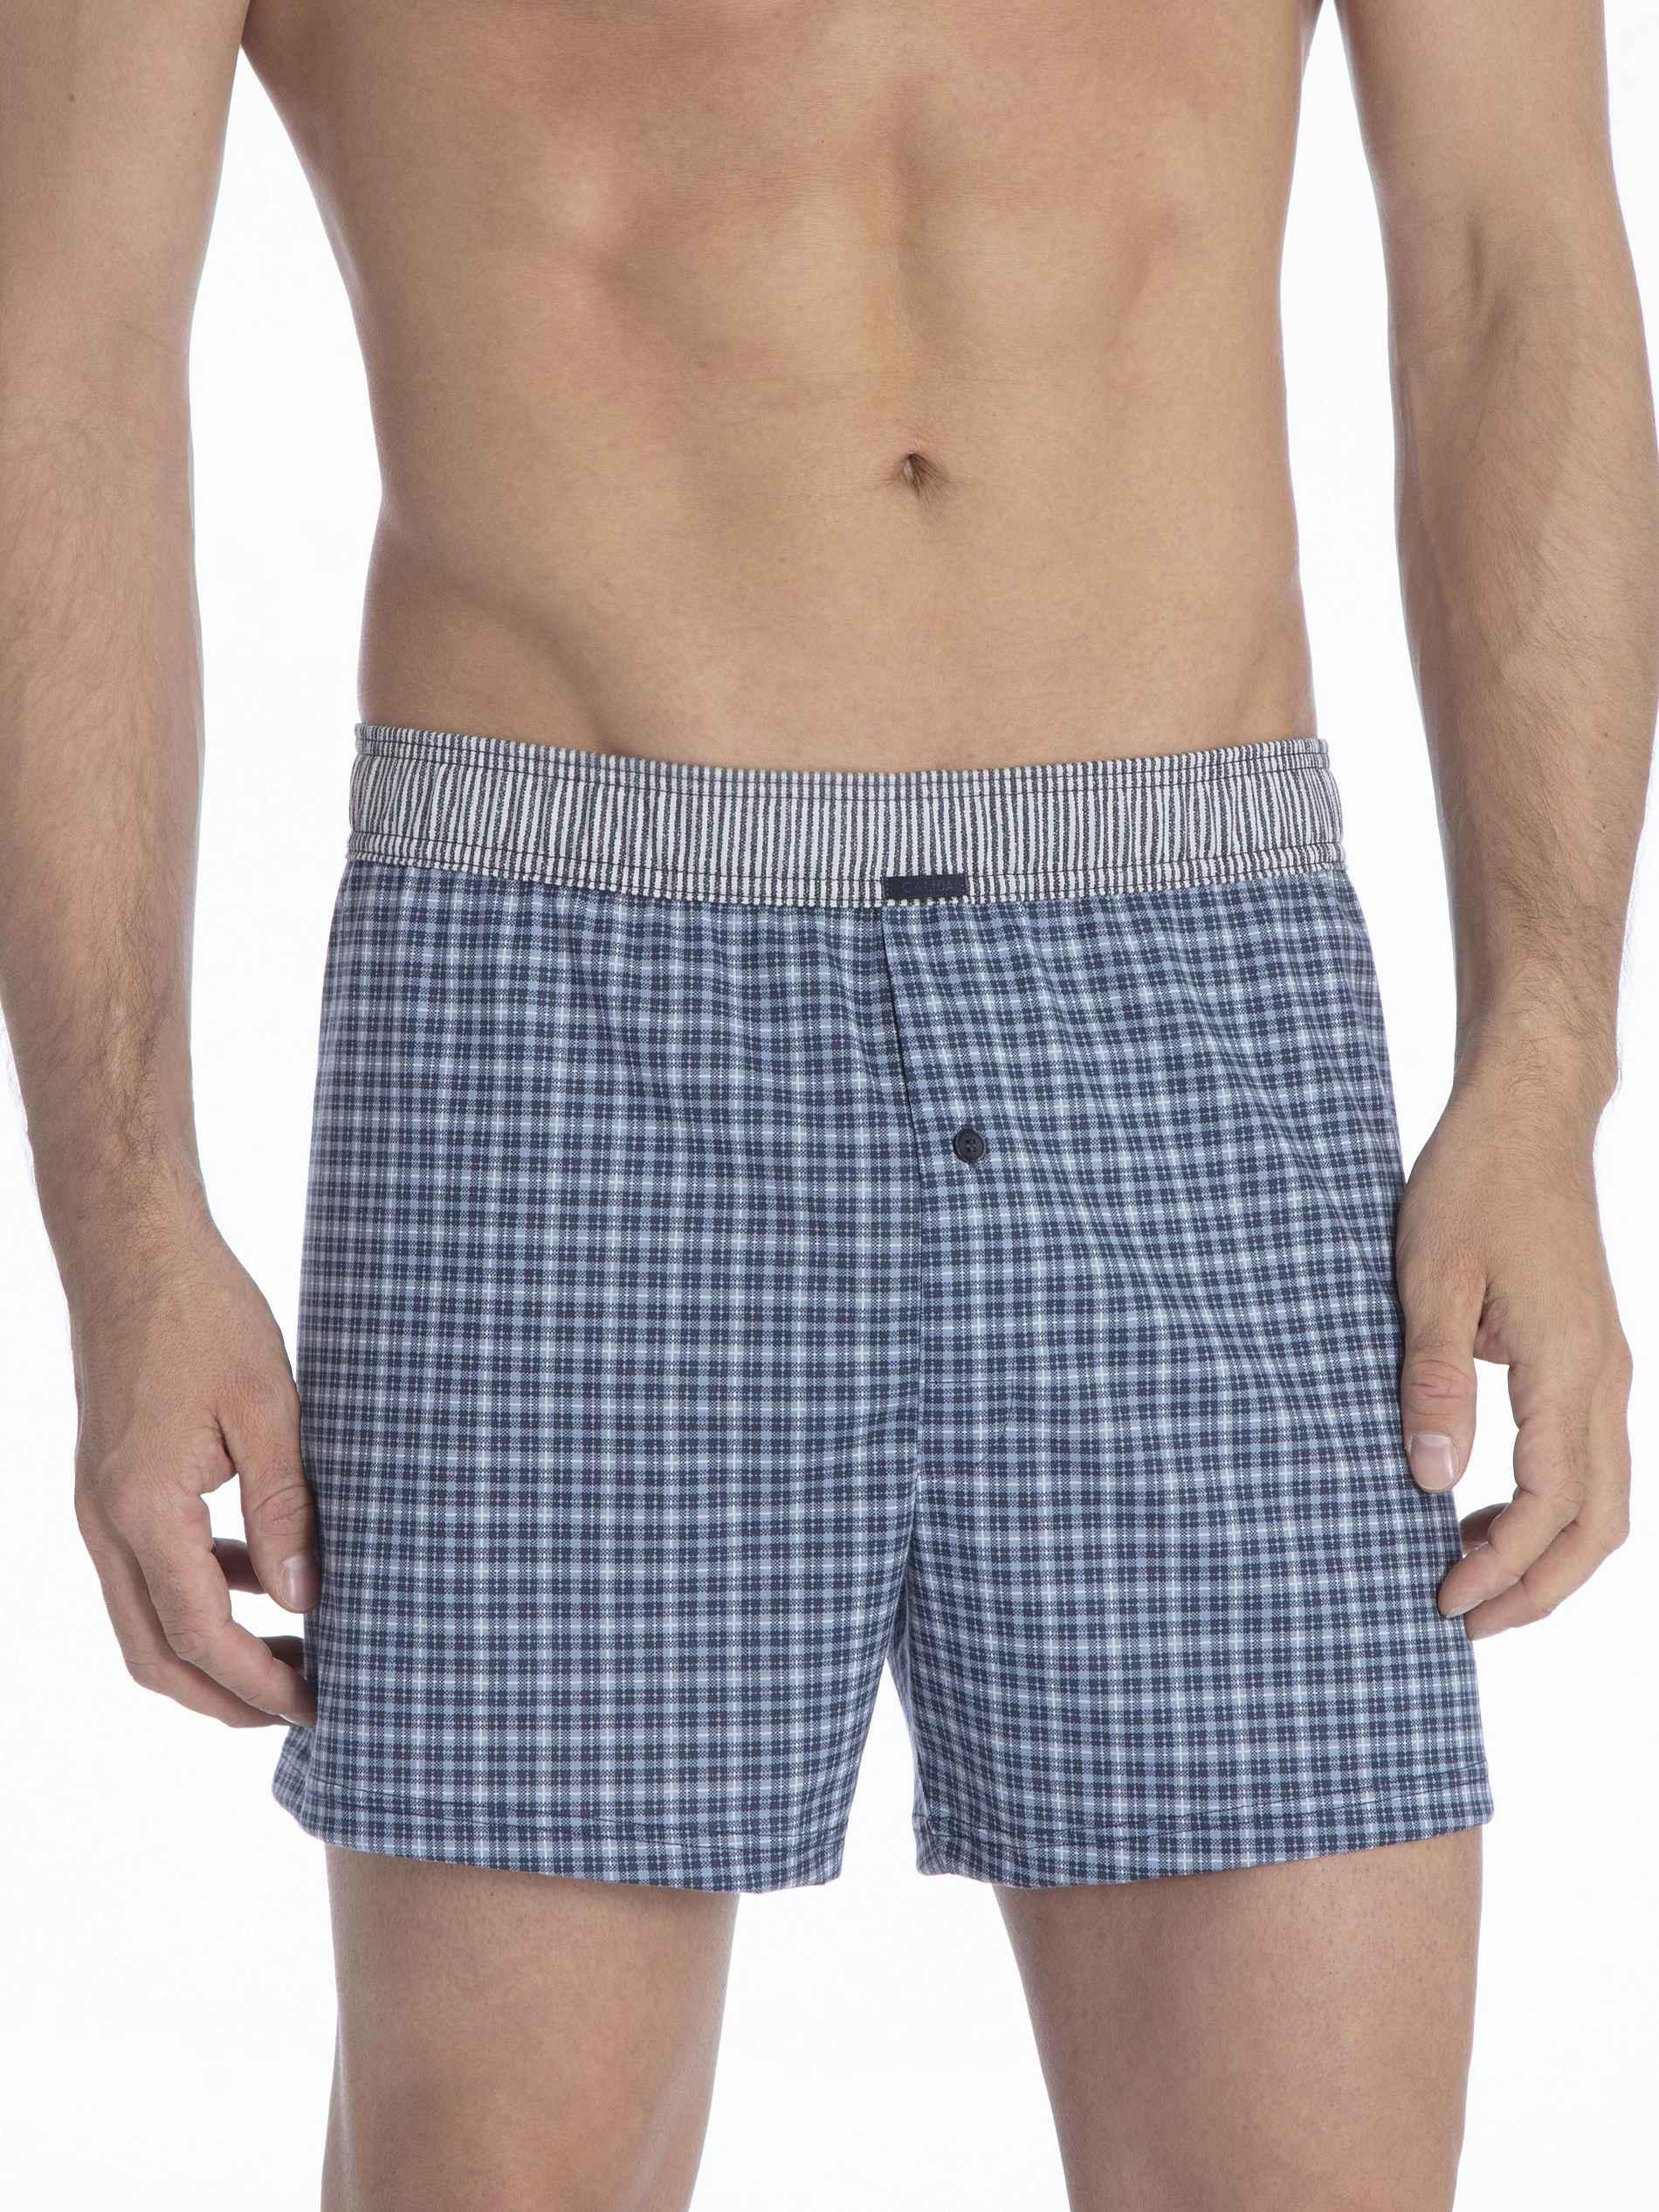 Herren CALIDA Urban Boxer Jersey-Boxershorts, überzogener Bund blau   07613381044865